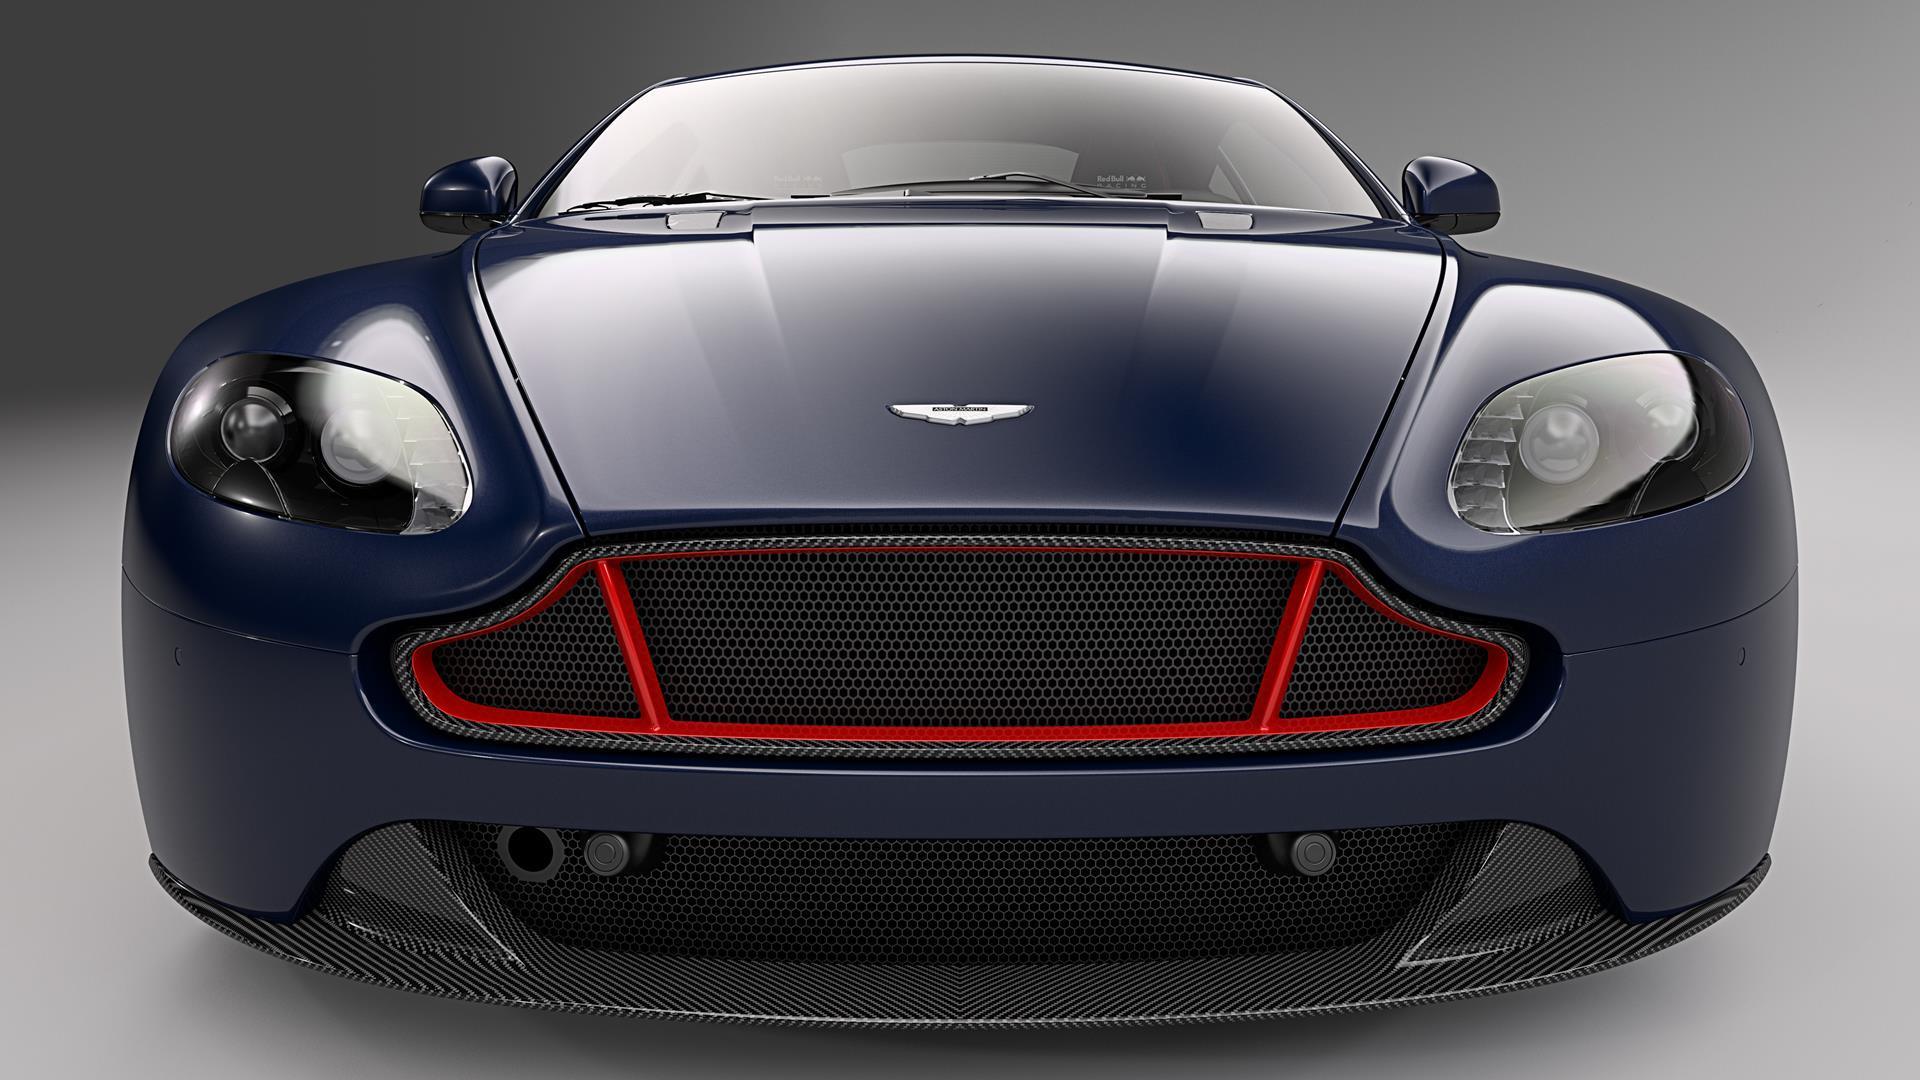 2017 Aston Martin Vantage S Red Bull Racing Edition Wallpapers Hd Drivespark